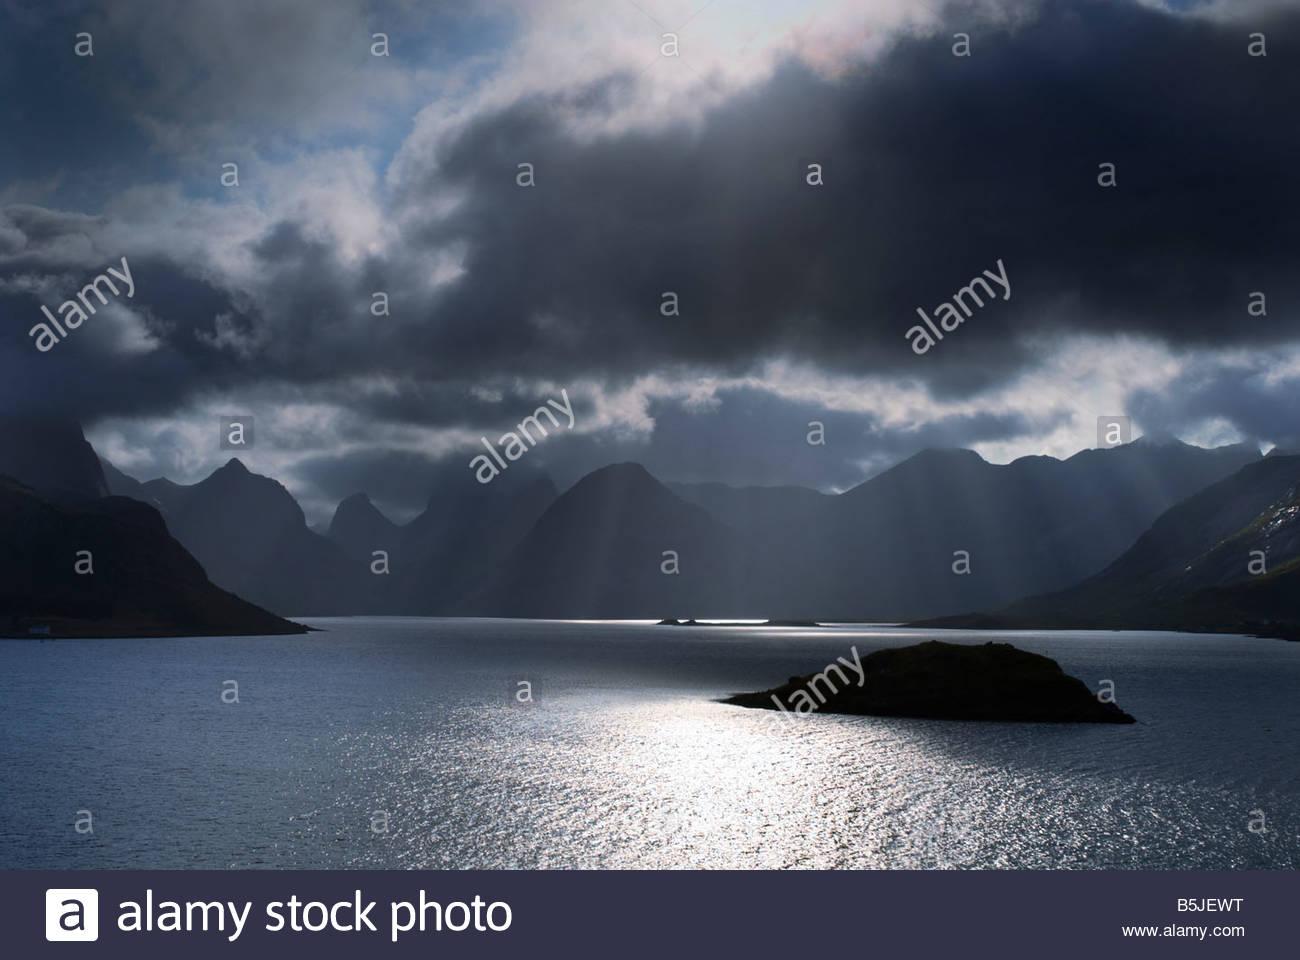 Stürmischer Himmel, Lofoten Inseln, Norwegen. Stockbild